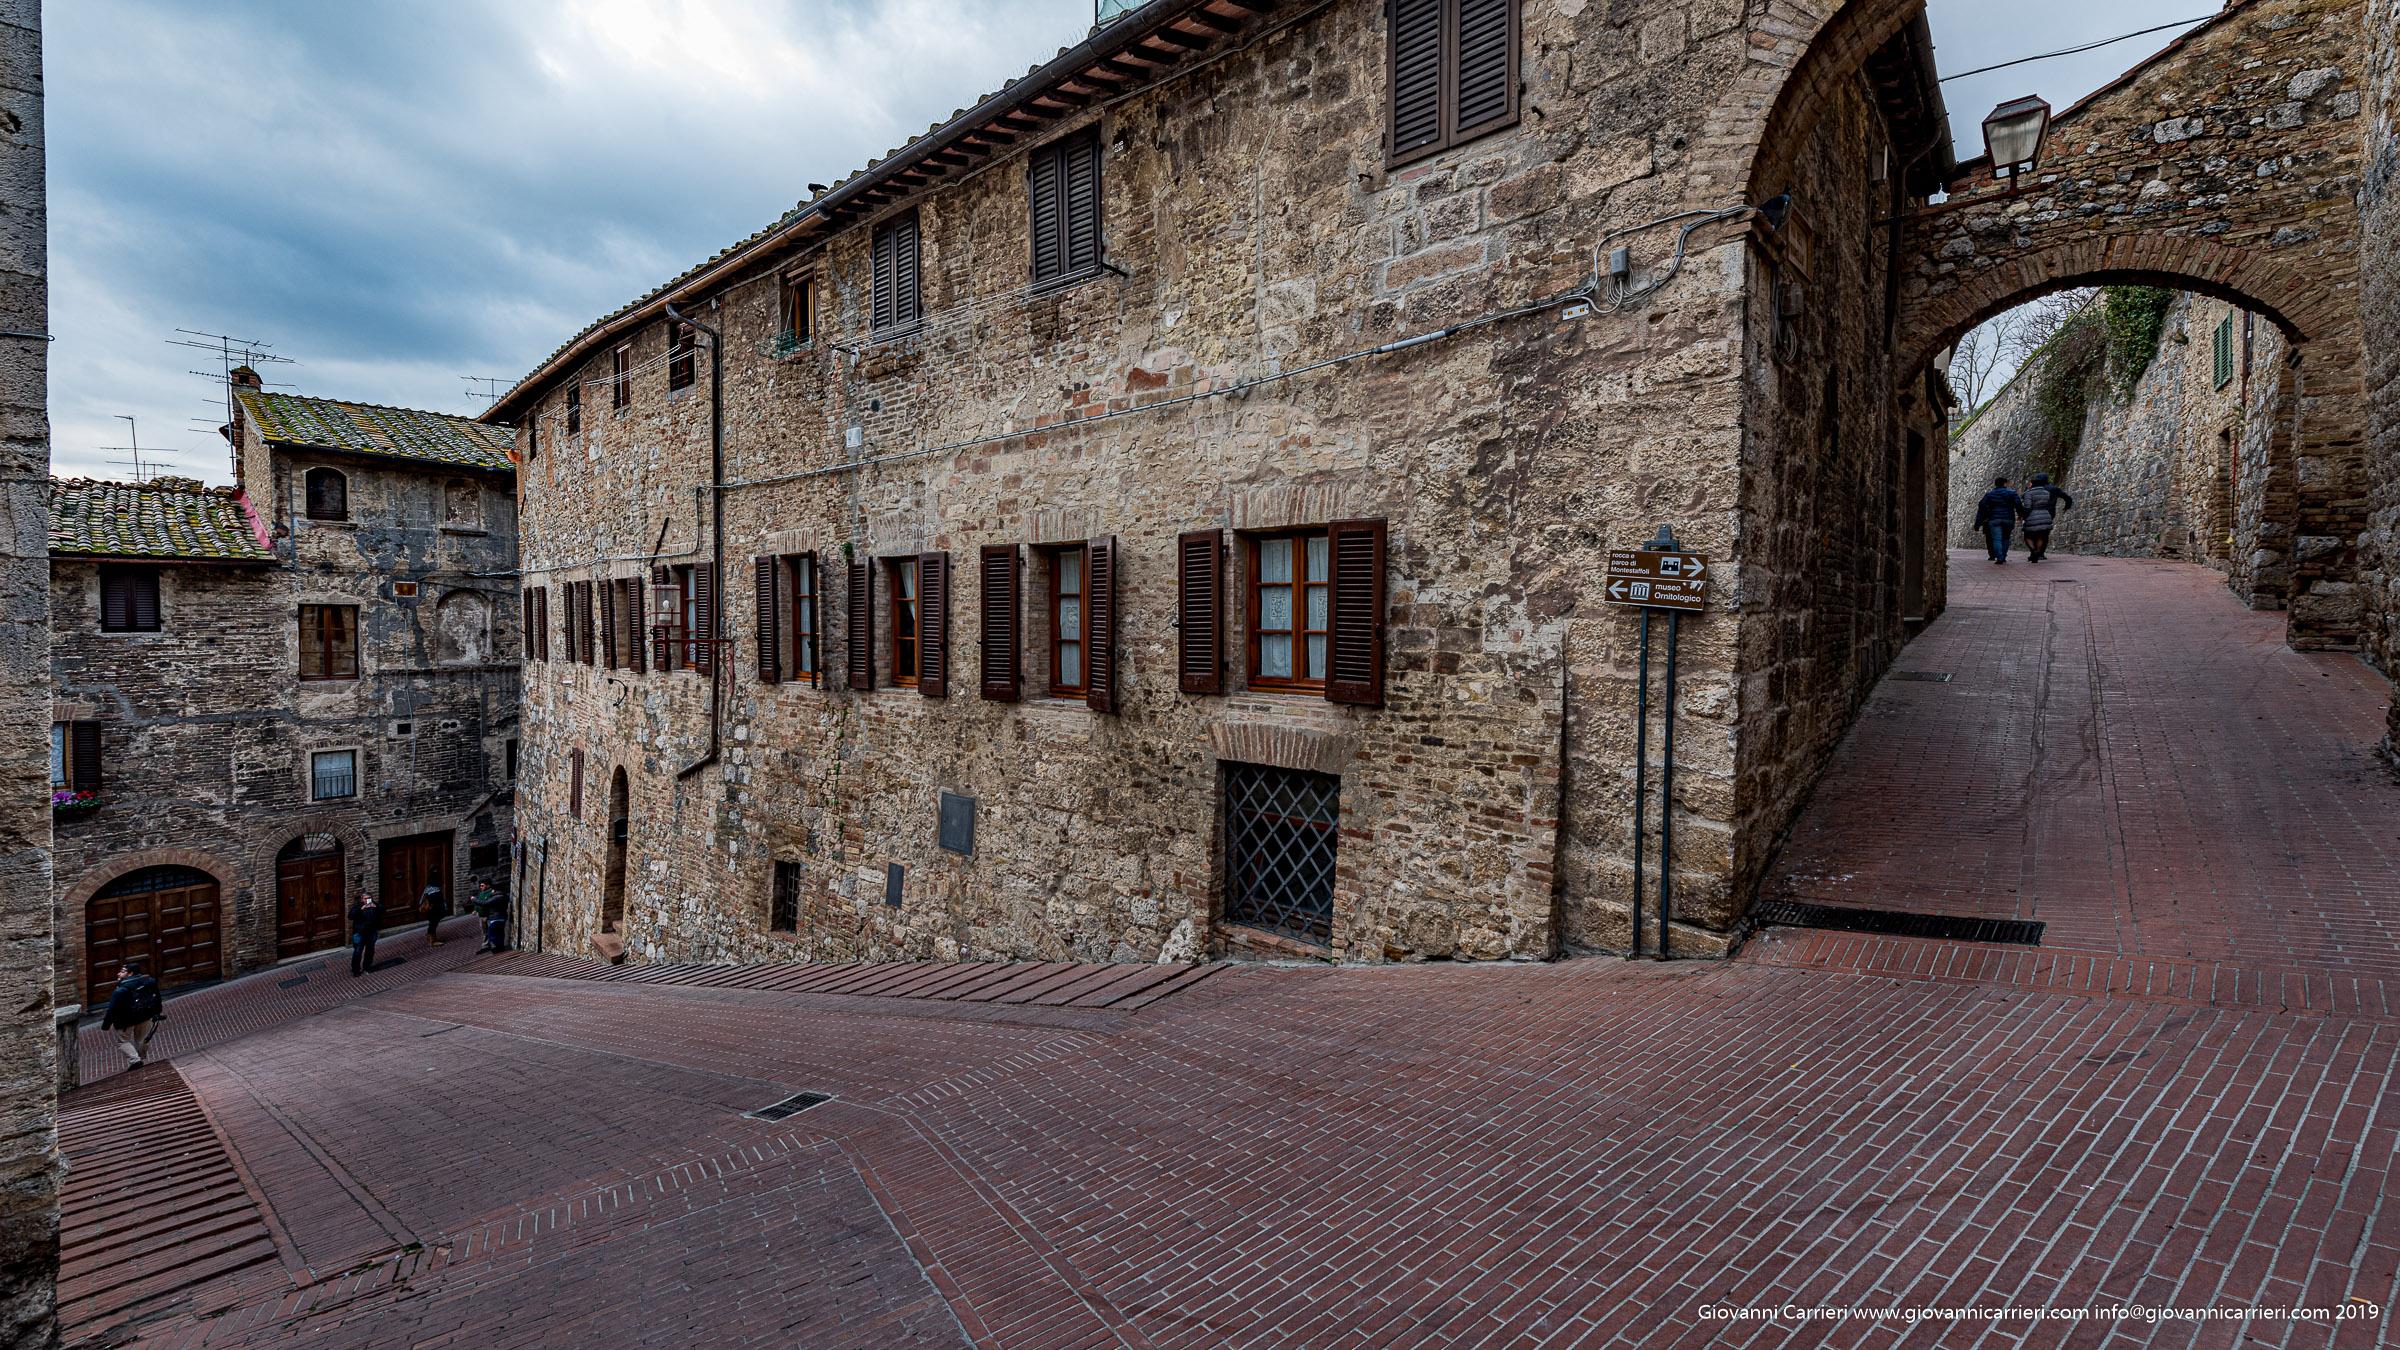 The historical centre of San Gimignano